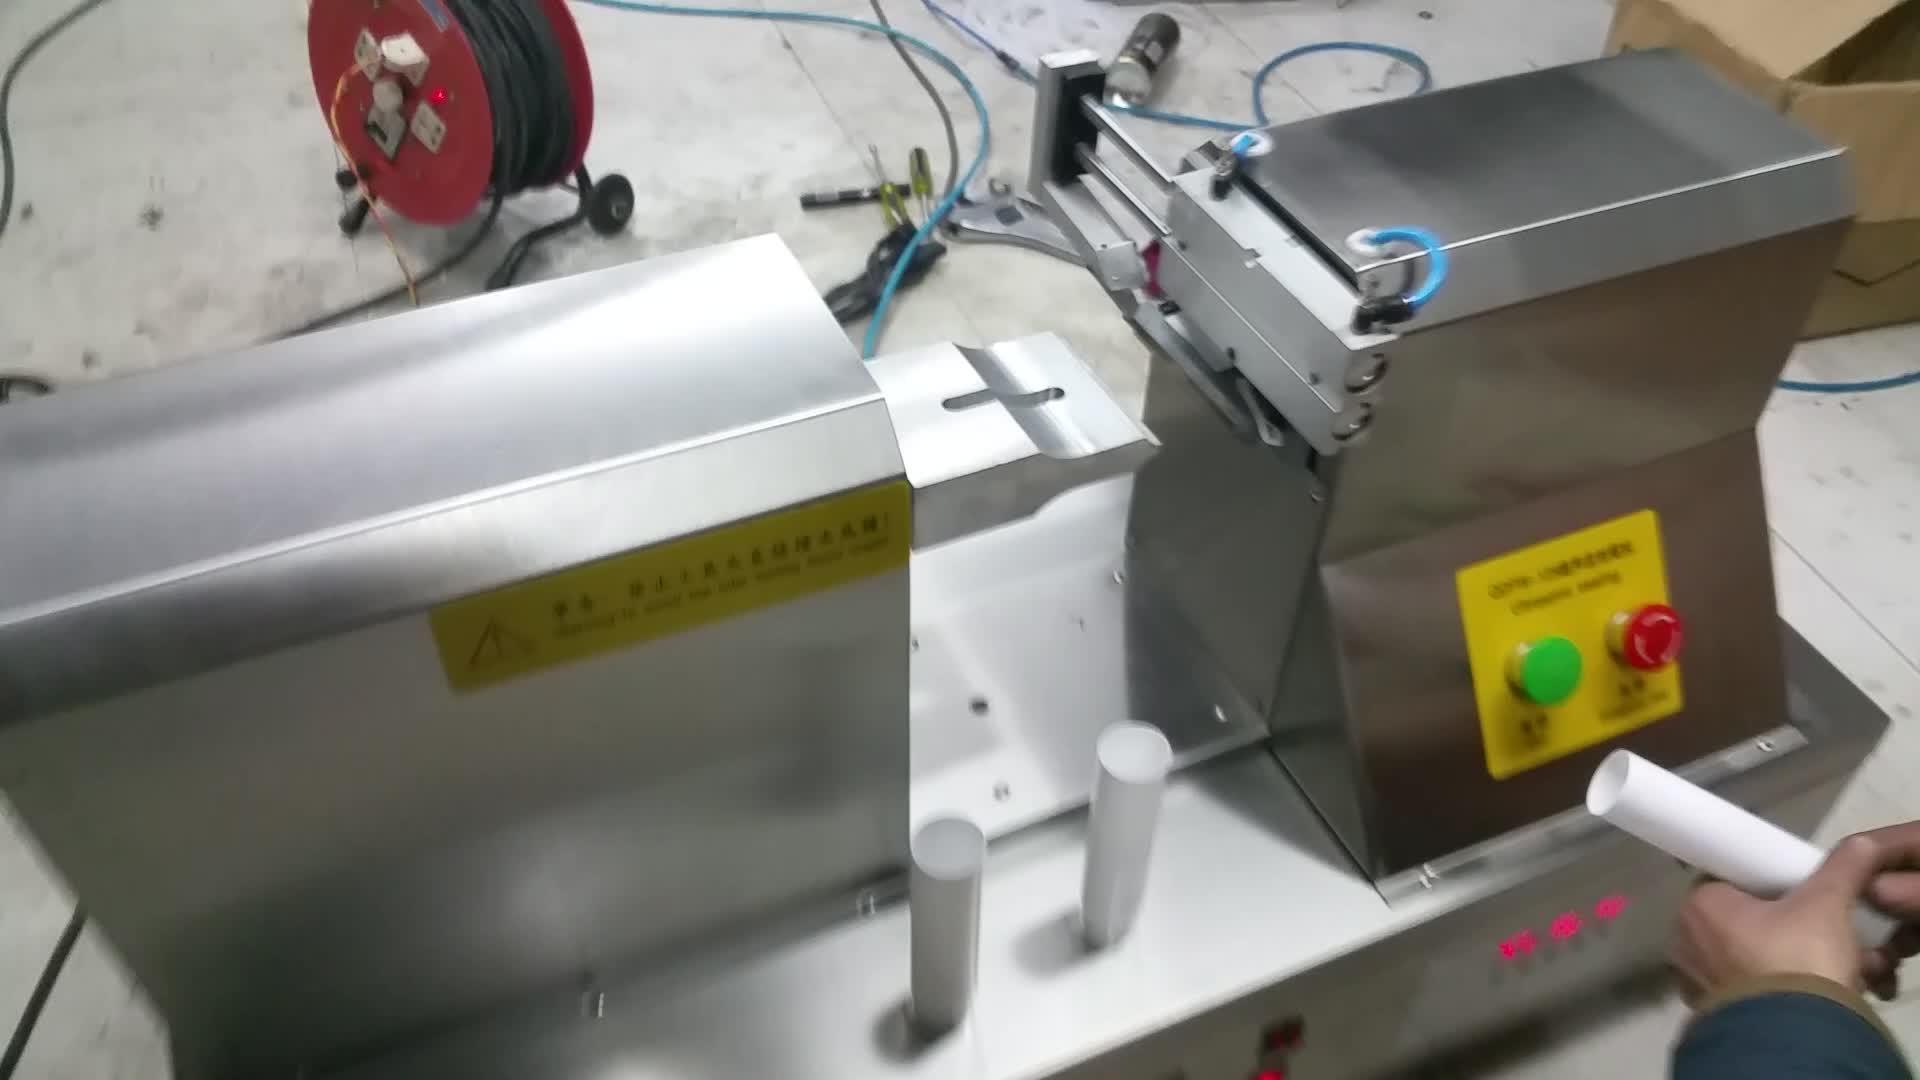 अल्ट्रासोनिक लहर सील हाथ क्रीम नरम ट्यूब मुहर मशीन के लिए उत्पादन कार्यशाला